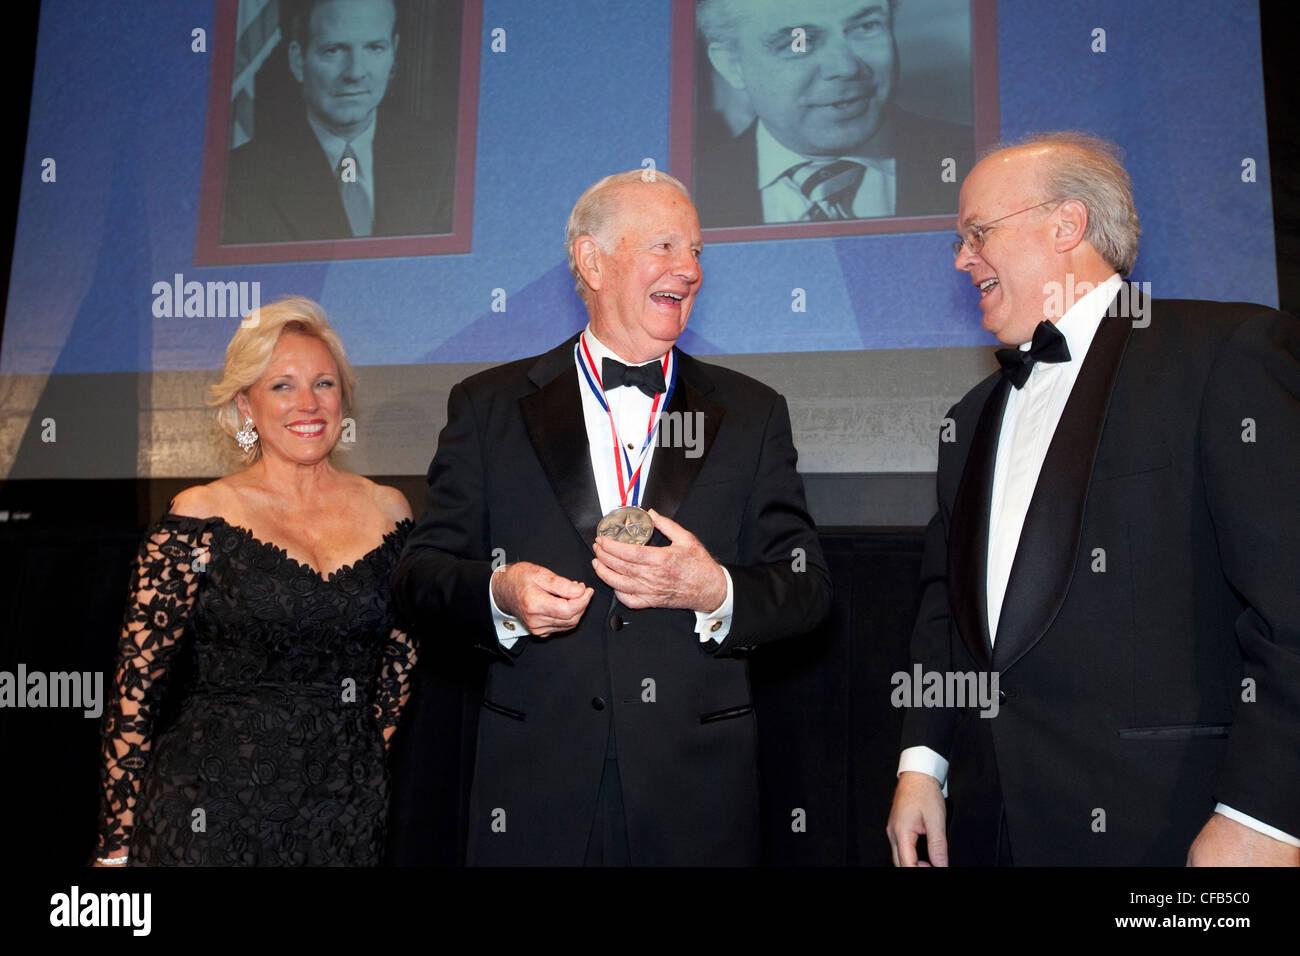 James A. Baker III von Houston, Diplomat und Staatsmann in drei US-Präsidenten, serviert bekommt legendären Stockbild